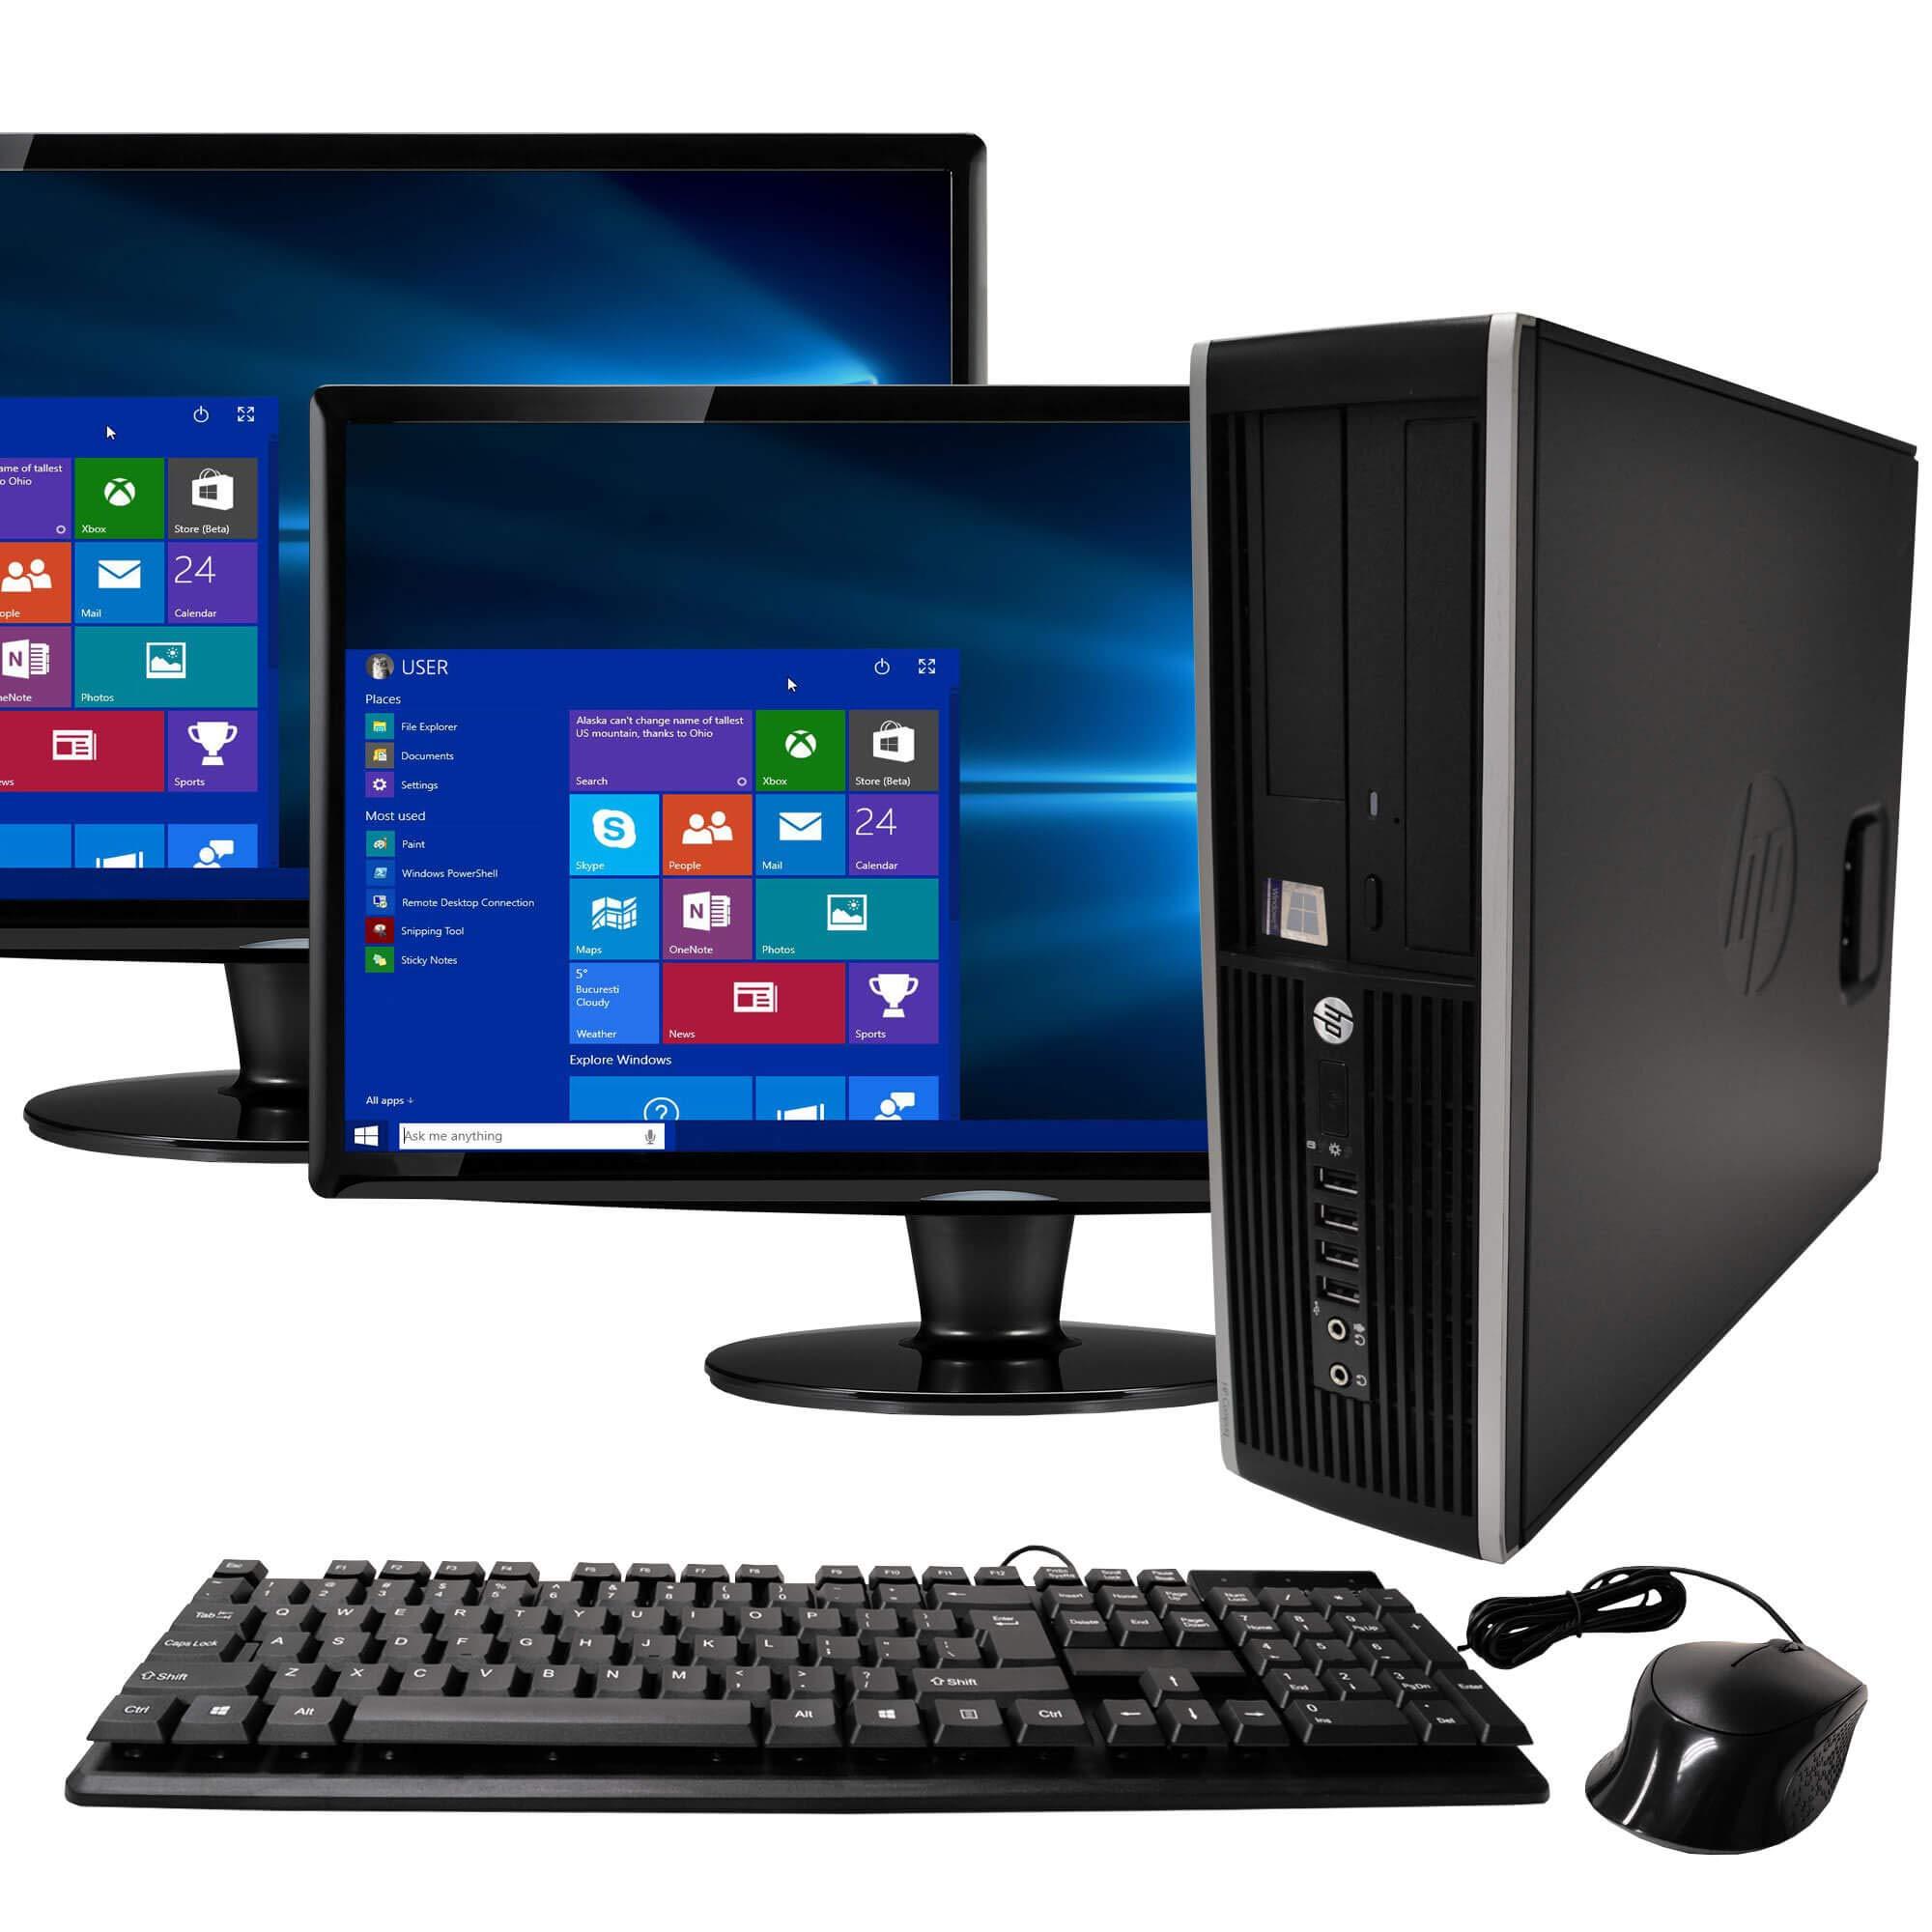 hp-elite-desktop-computer-intel-core-i5-31ghz-8gb-ram-1tb-sata-hdd-keyboard-mouse-wi-fi-dual-19in-lcd-monitors-brands-vary-dvd-rom-windows-10-renewed